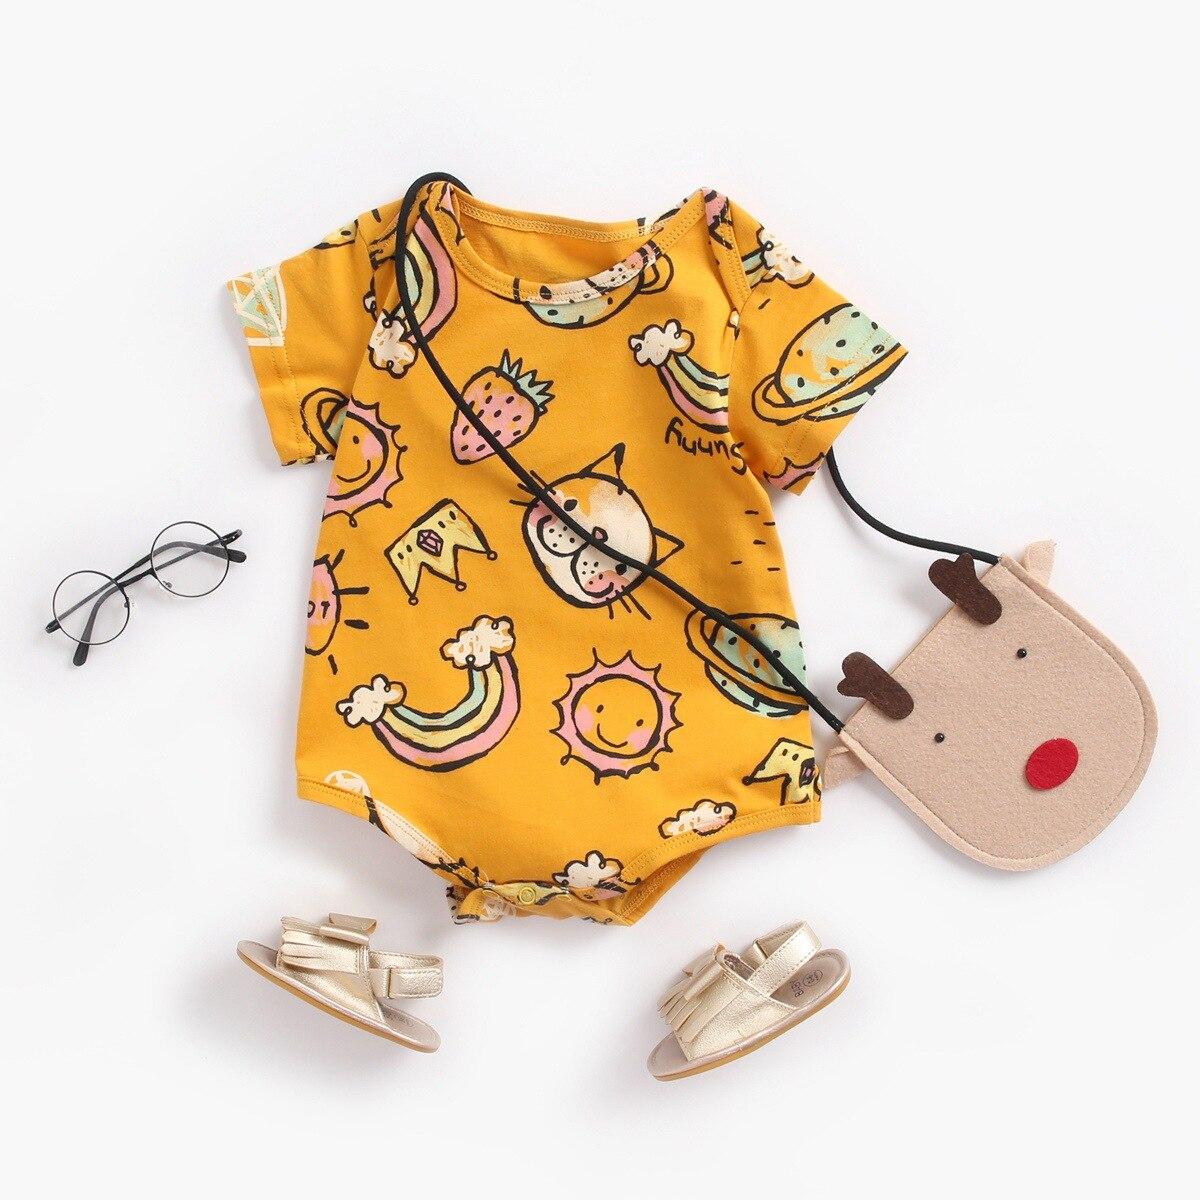 Yg brand children's clothing 2021 summer new baby one-piece cute cartoon cotton triangle short climb